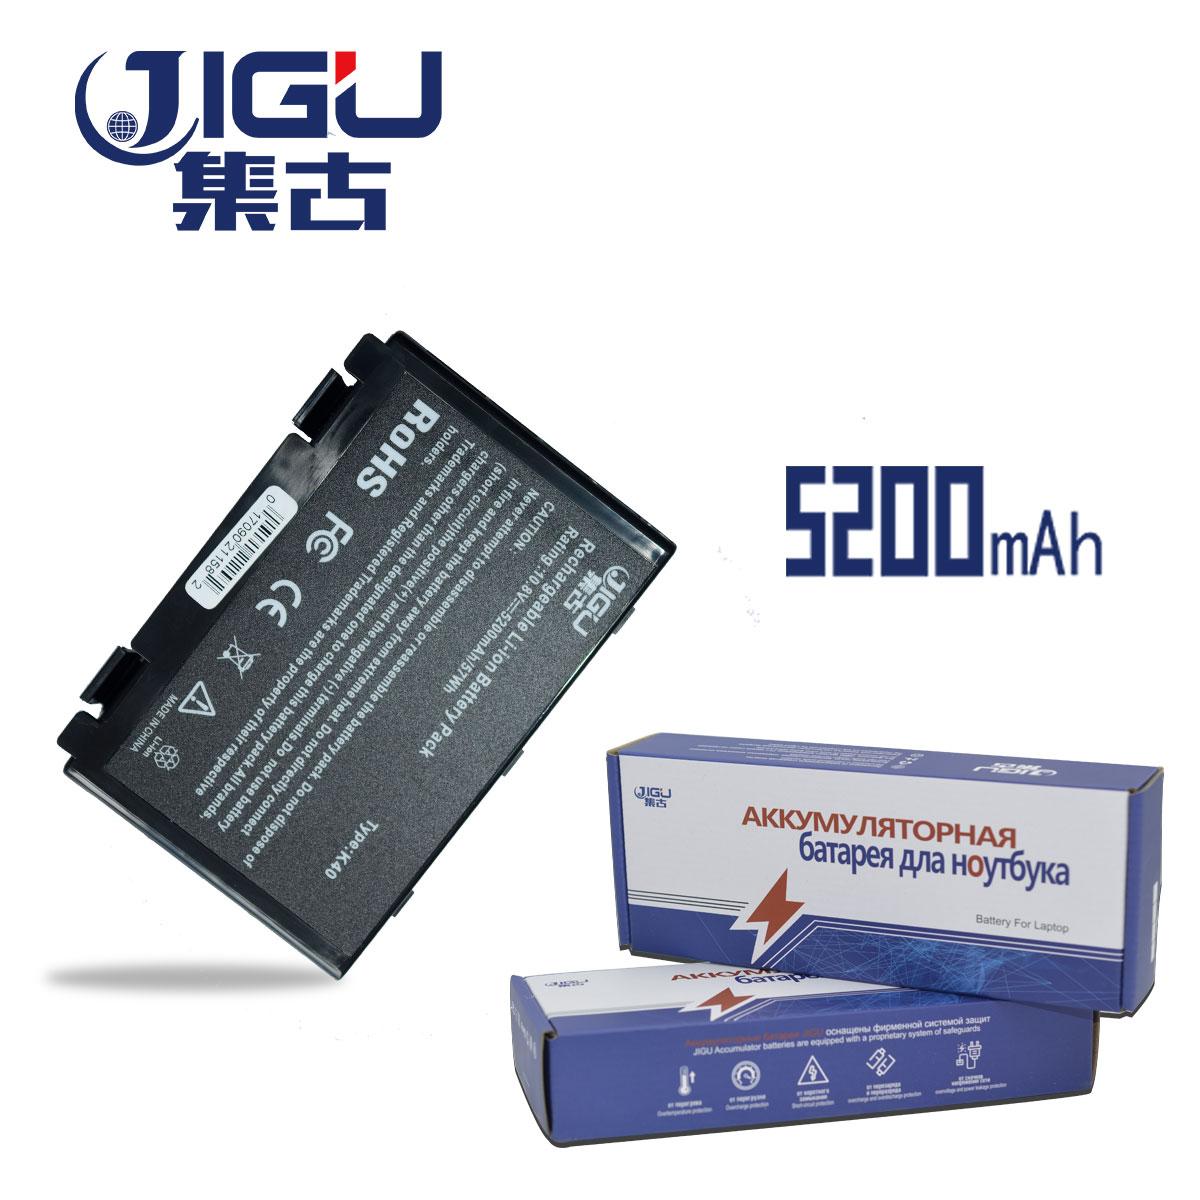 JIGU 5200mah Laptop Battery For Asus A32-f82 A32-f52 A32 F82 F52 K50ij K50 K51 K50ab K40in K50ij K40 K42 K42j K50in K60 K61 K70 russian ru keyboard for asus k50 k50a k51 p50 k51 k60 k61 k50in k62 k70 k70a k70ad k70ij f90 f90sv x5d f52 f52a x5dc k72 k72jk page 3